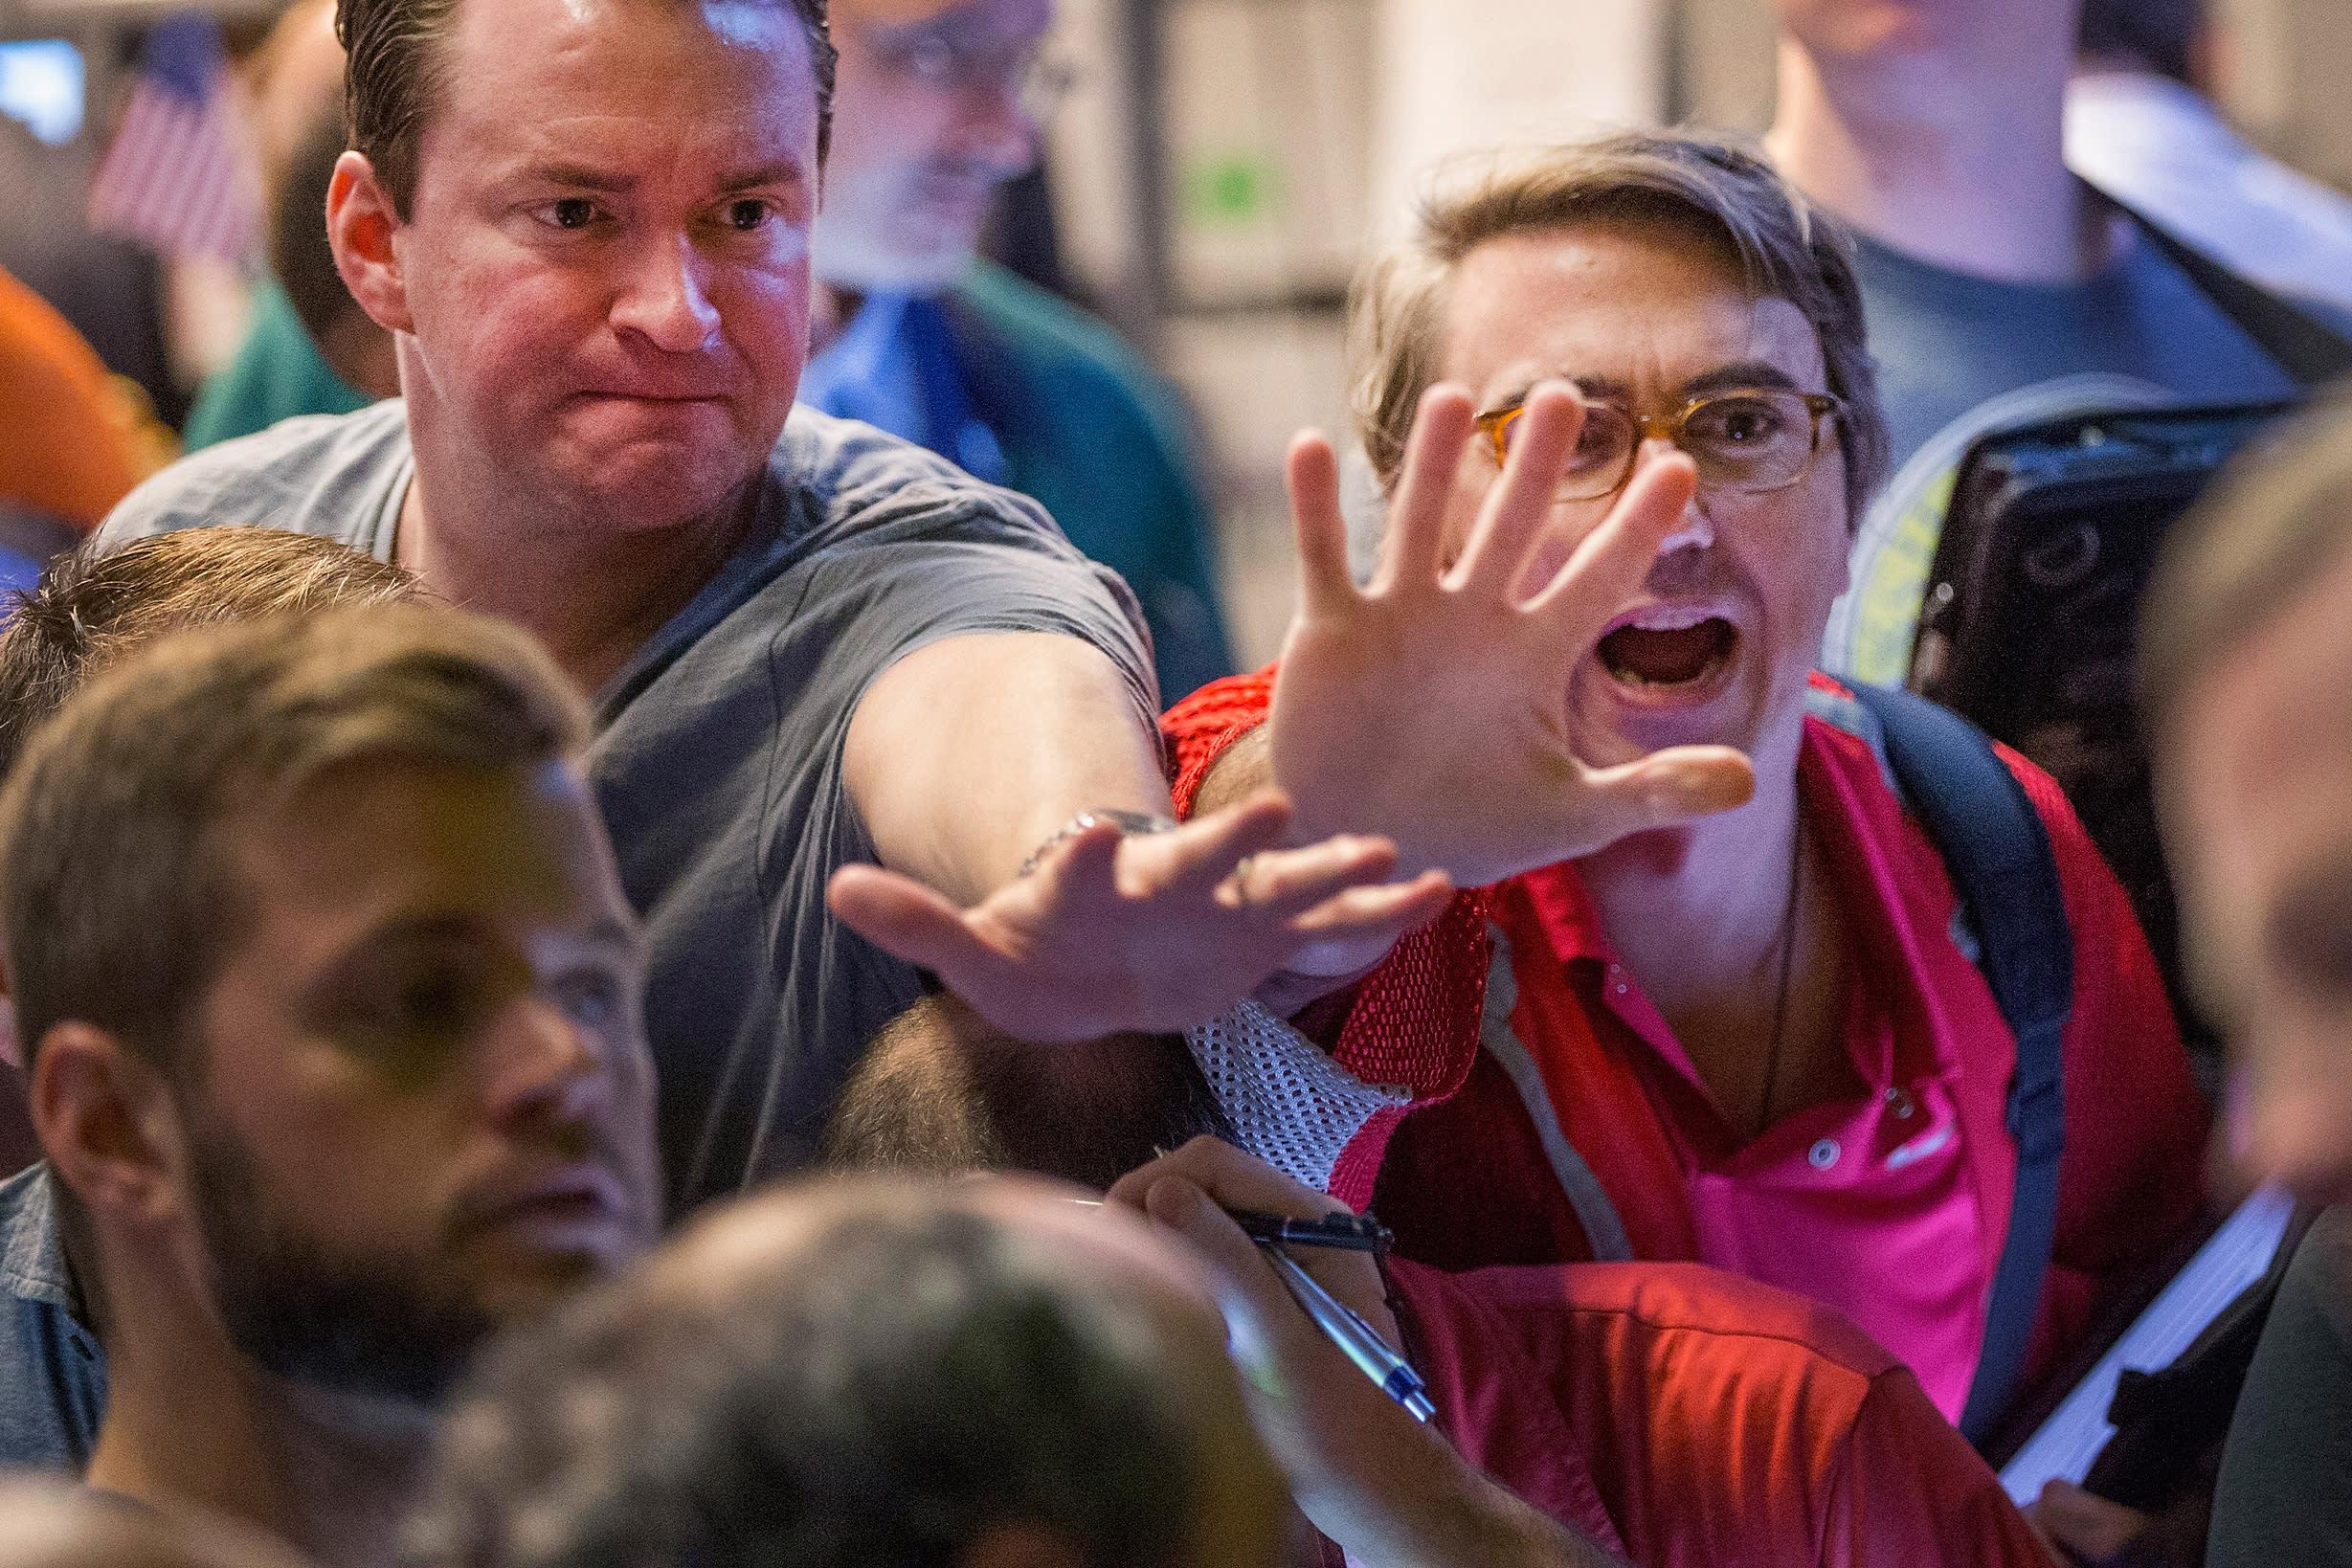 Morgan Stanley says economy on 'recession watch' amid bond warning